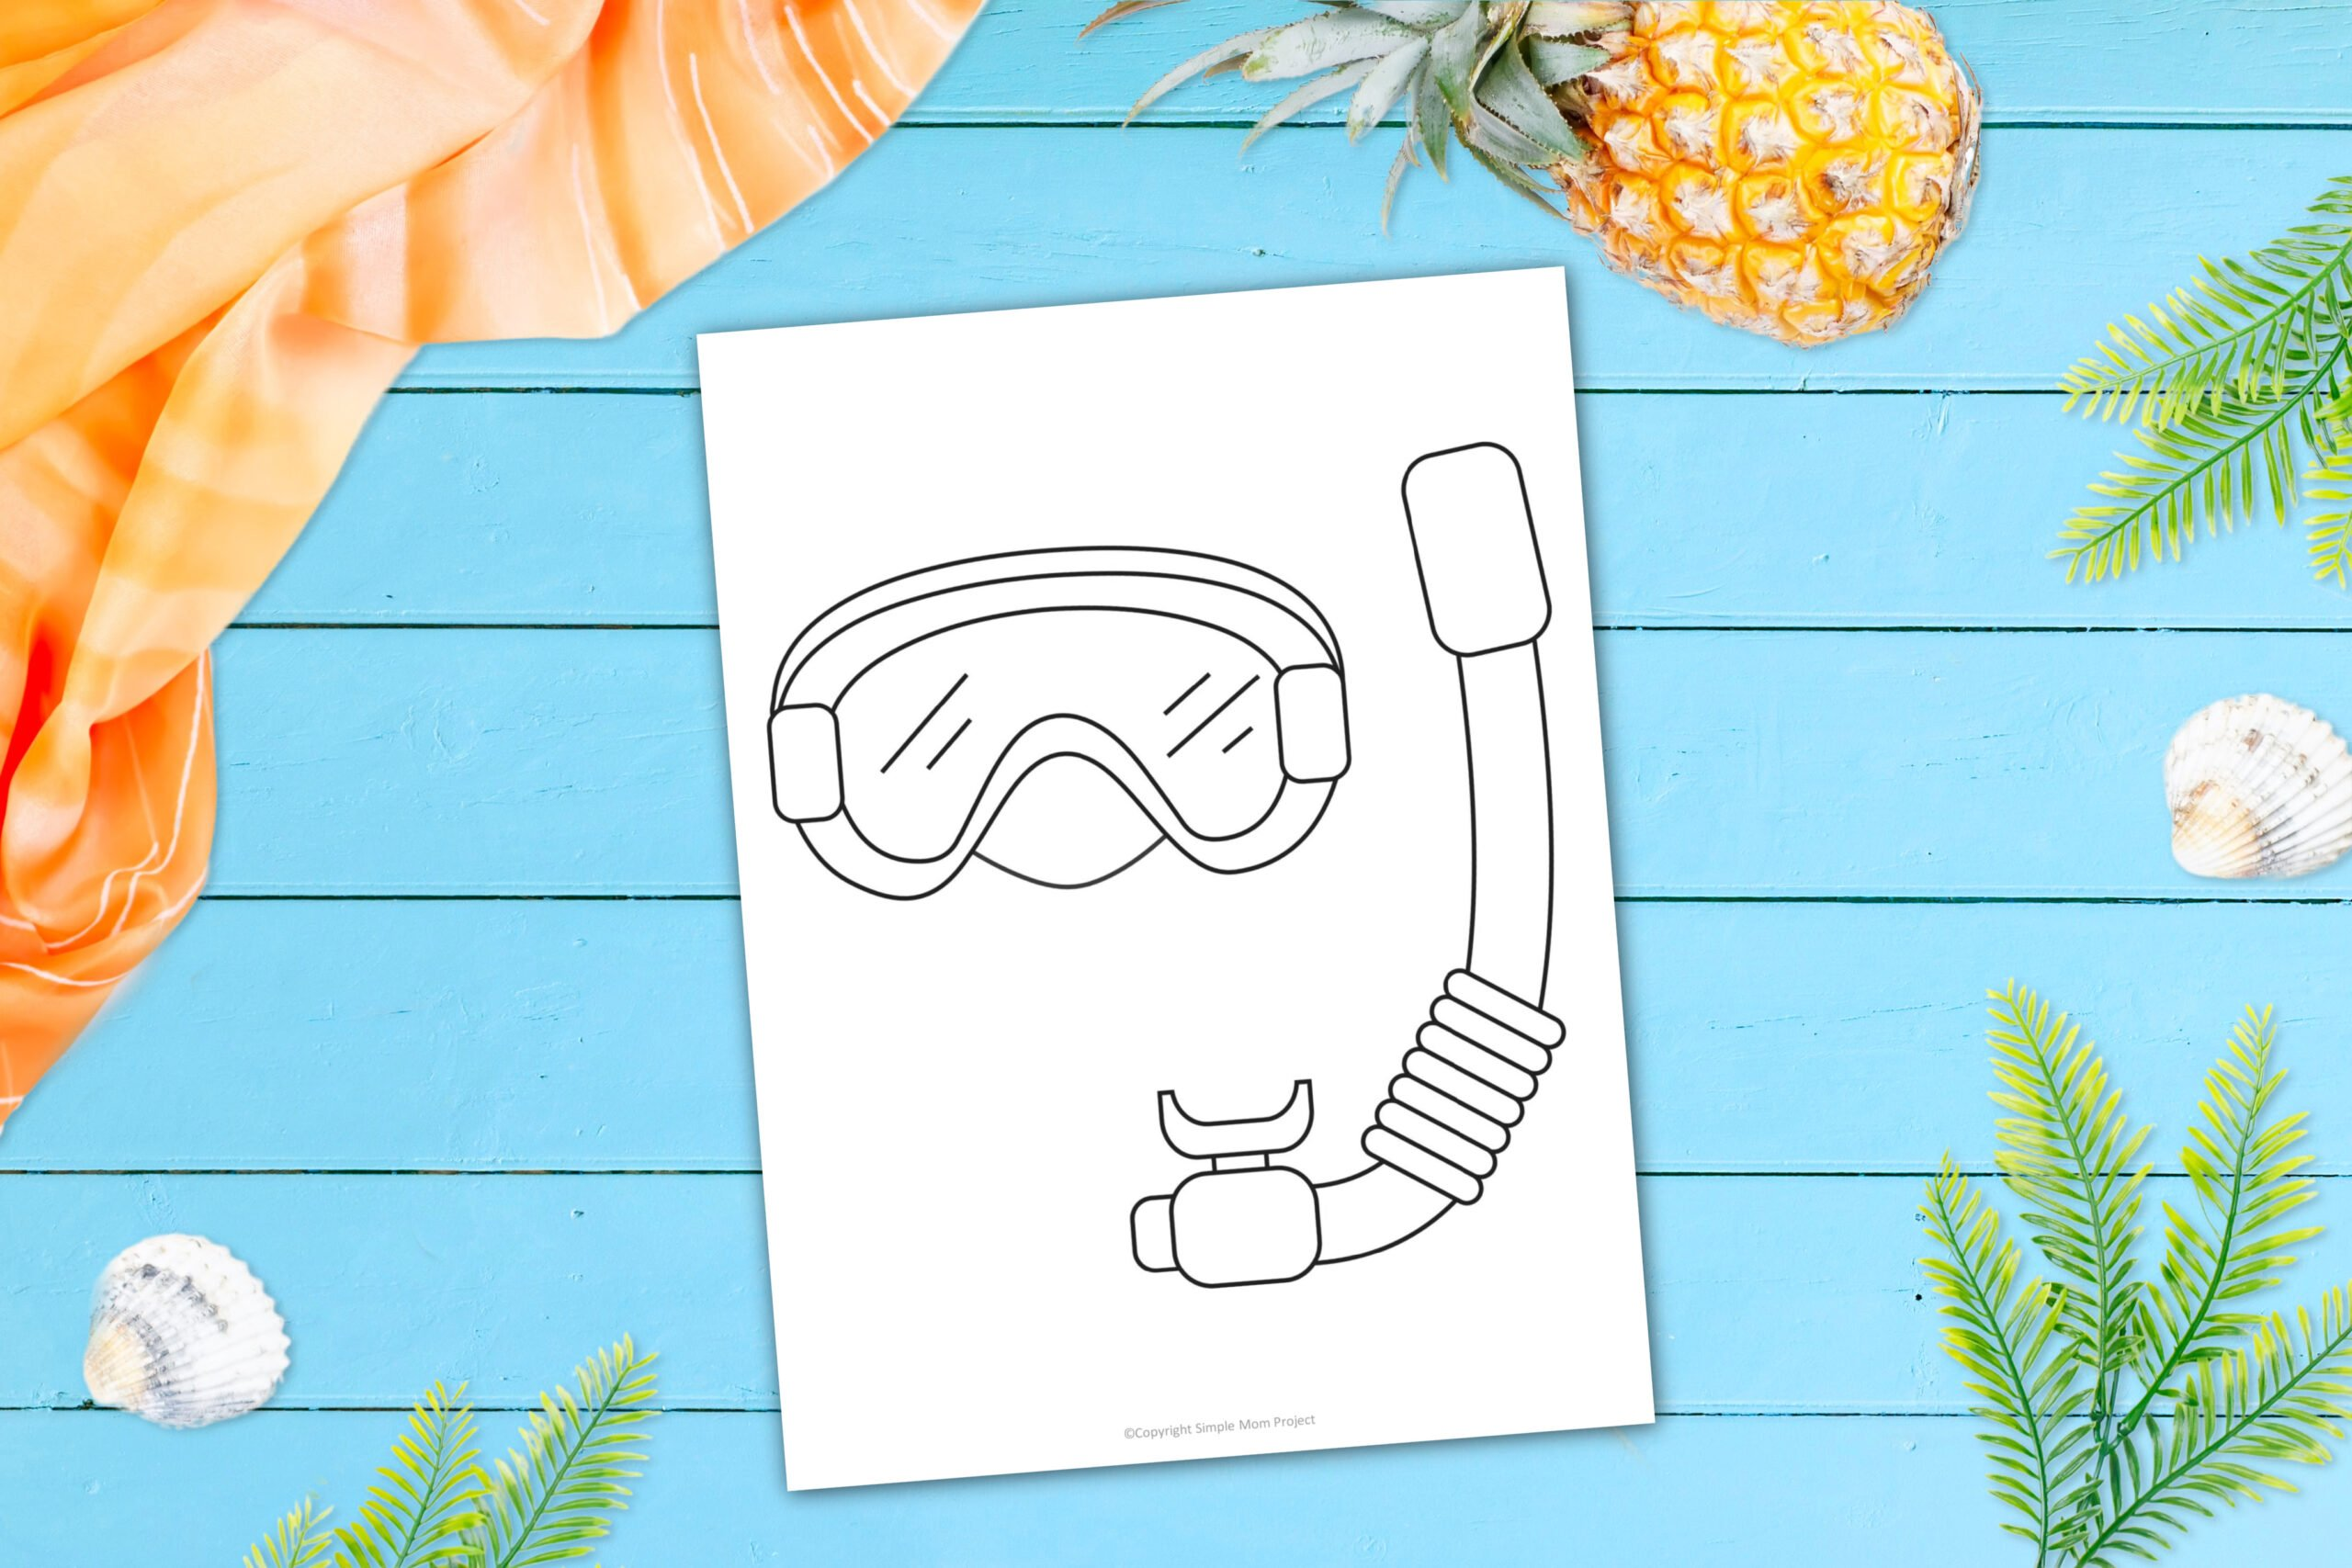 Free Printable Summer Beach Snorkel Template for Kids, preschooler and toddler